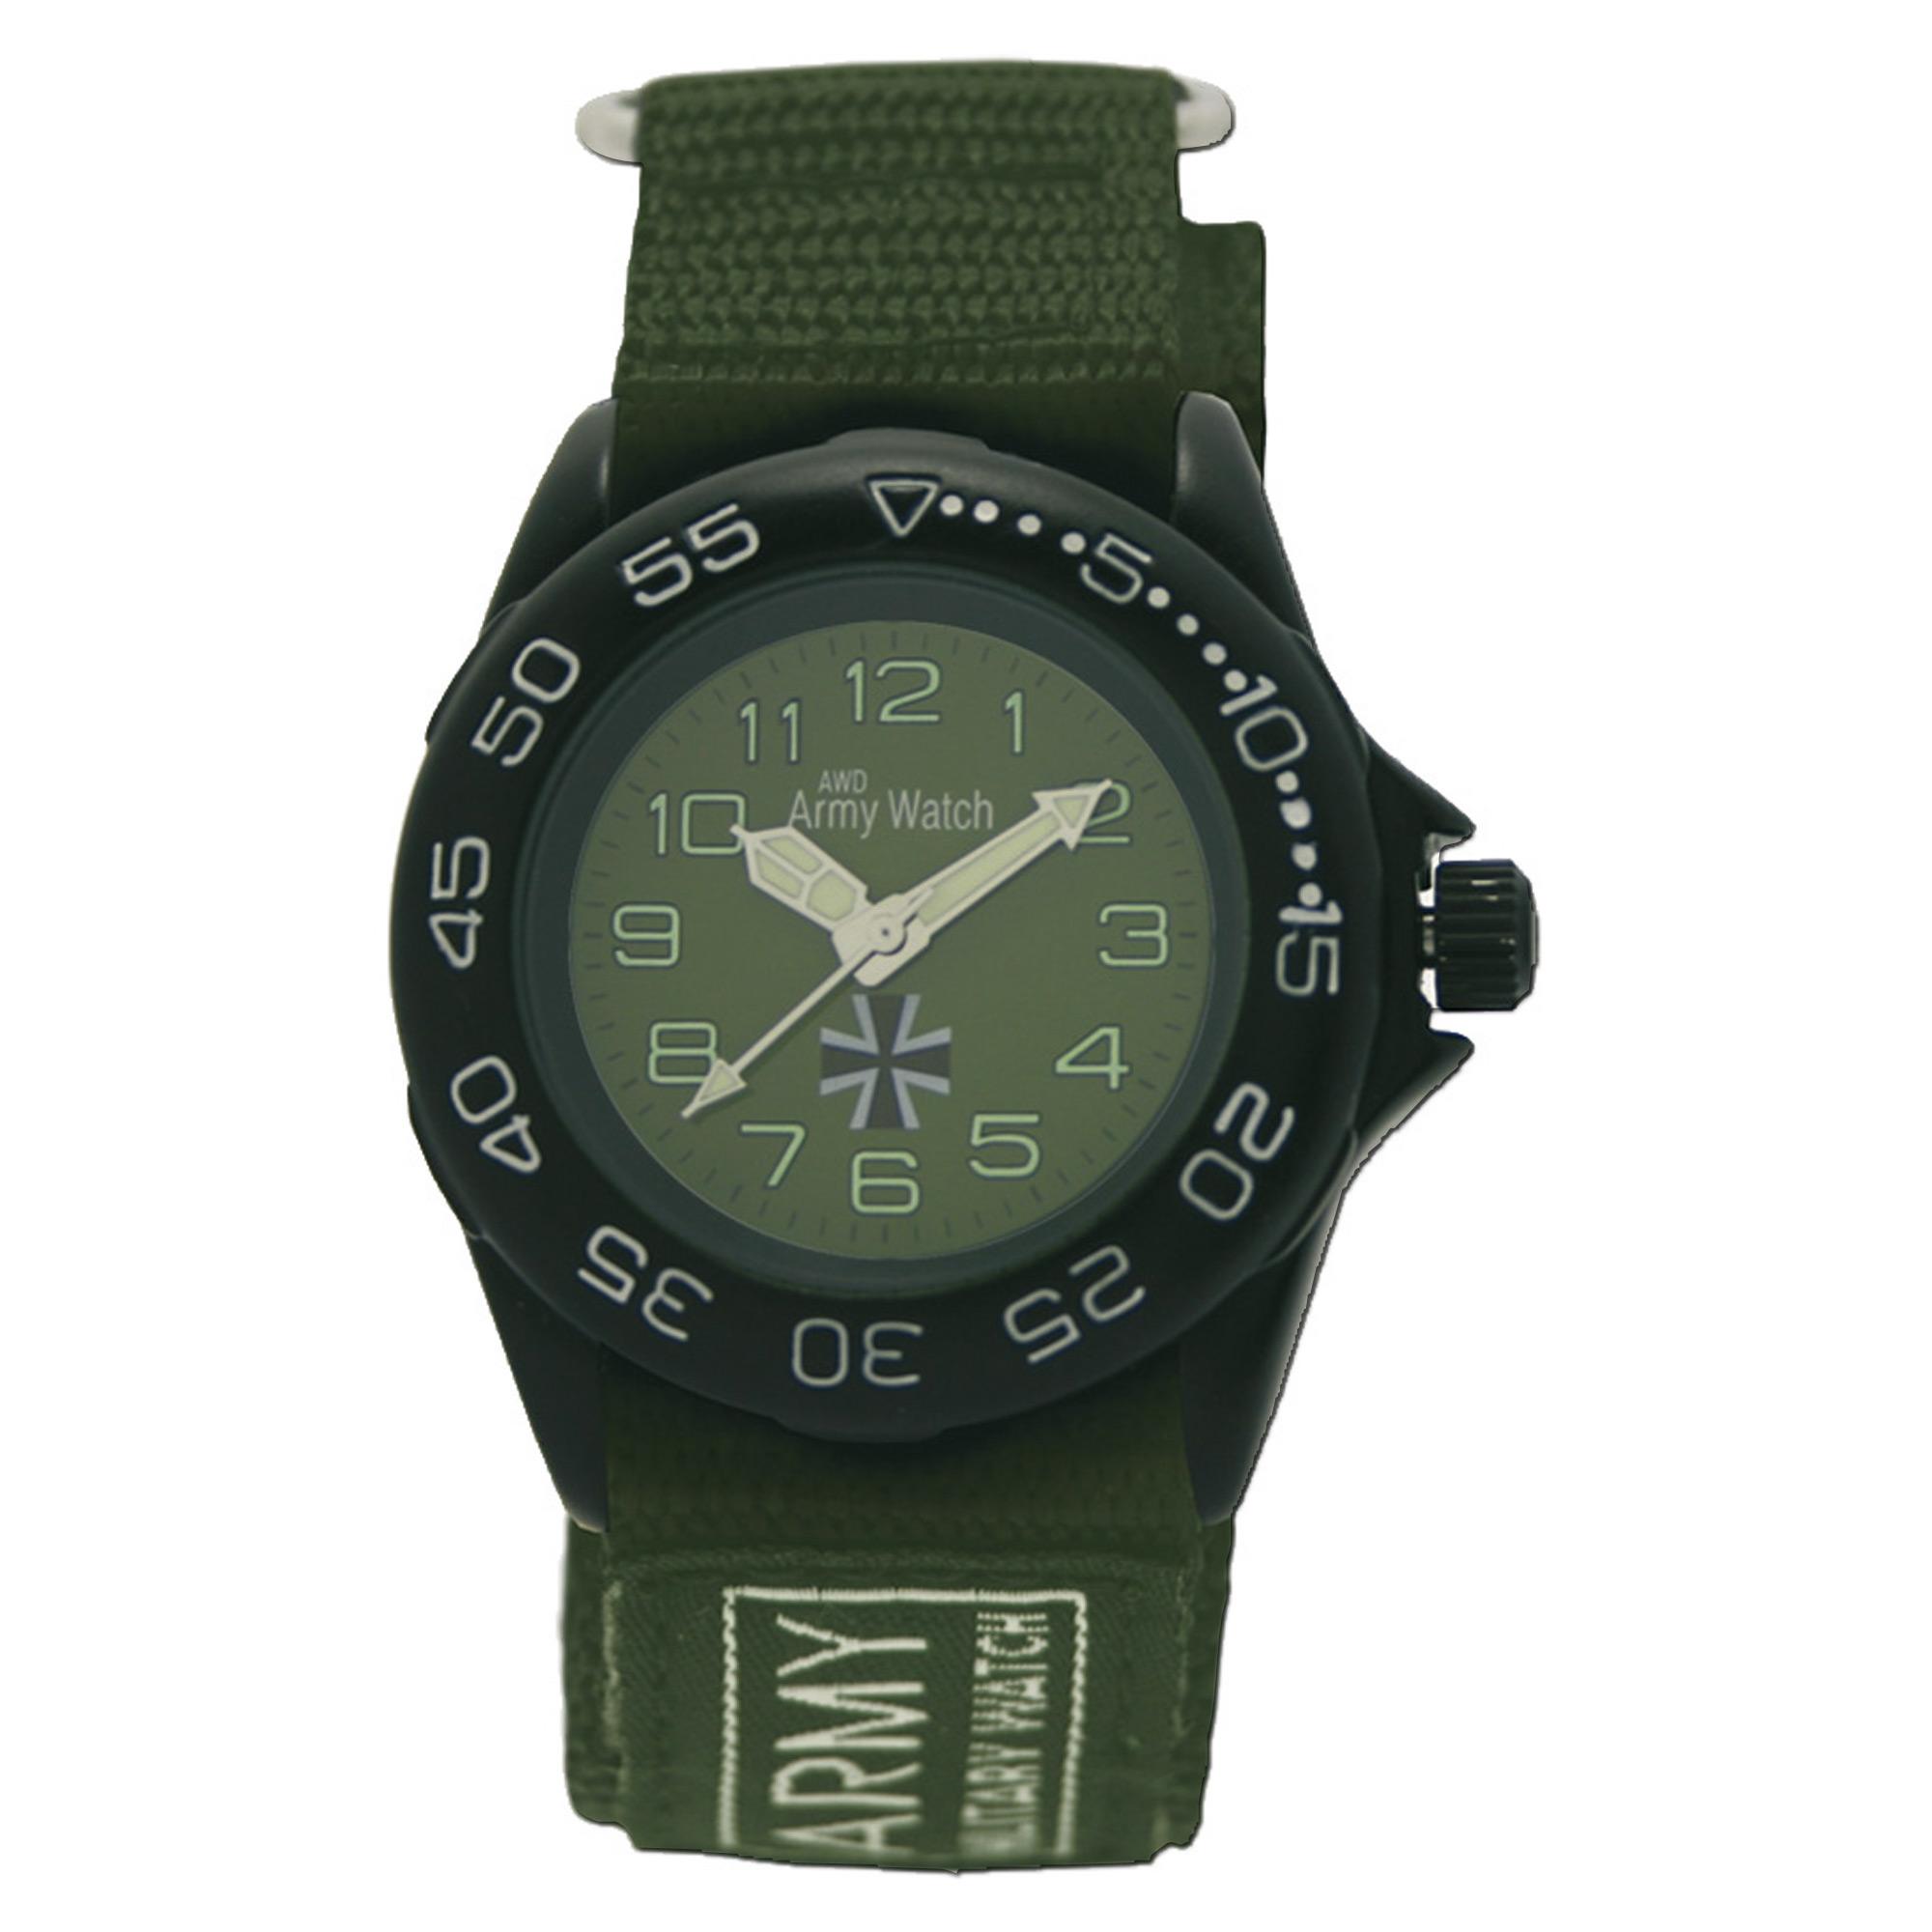 Orologio militare, marca Army Watch